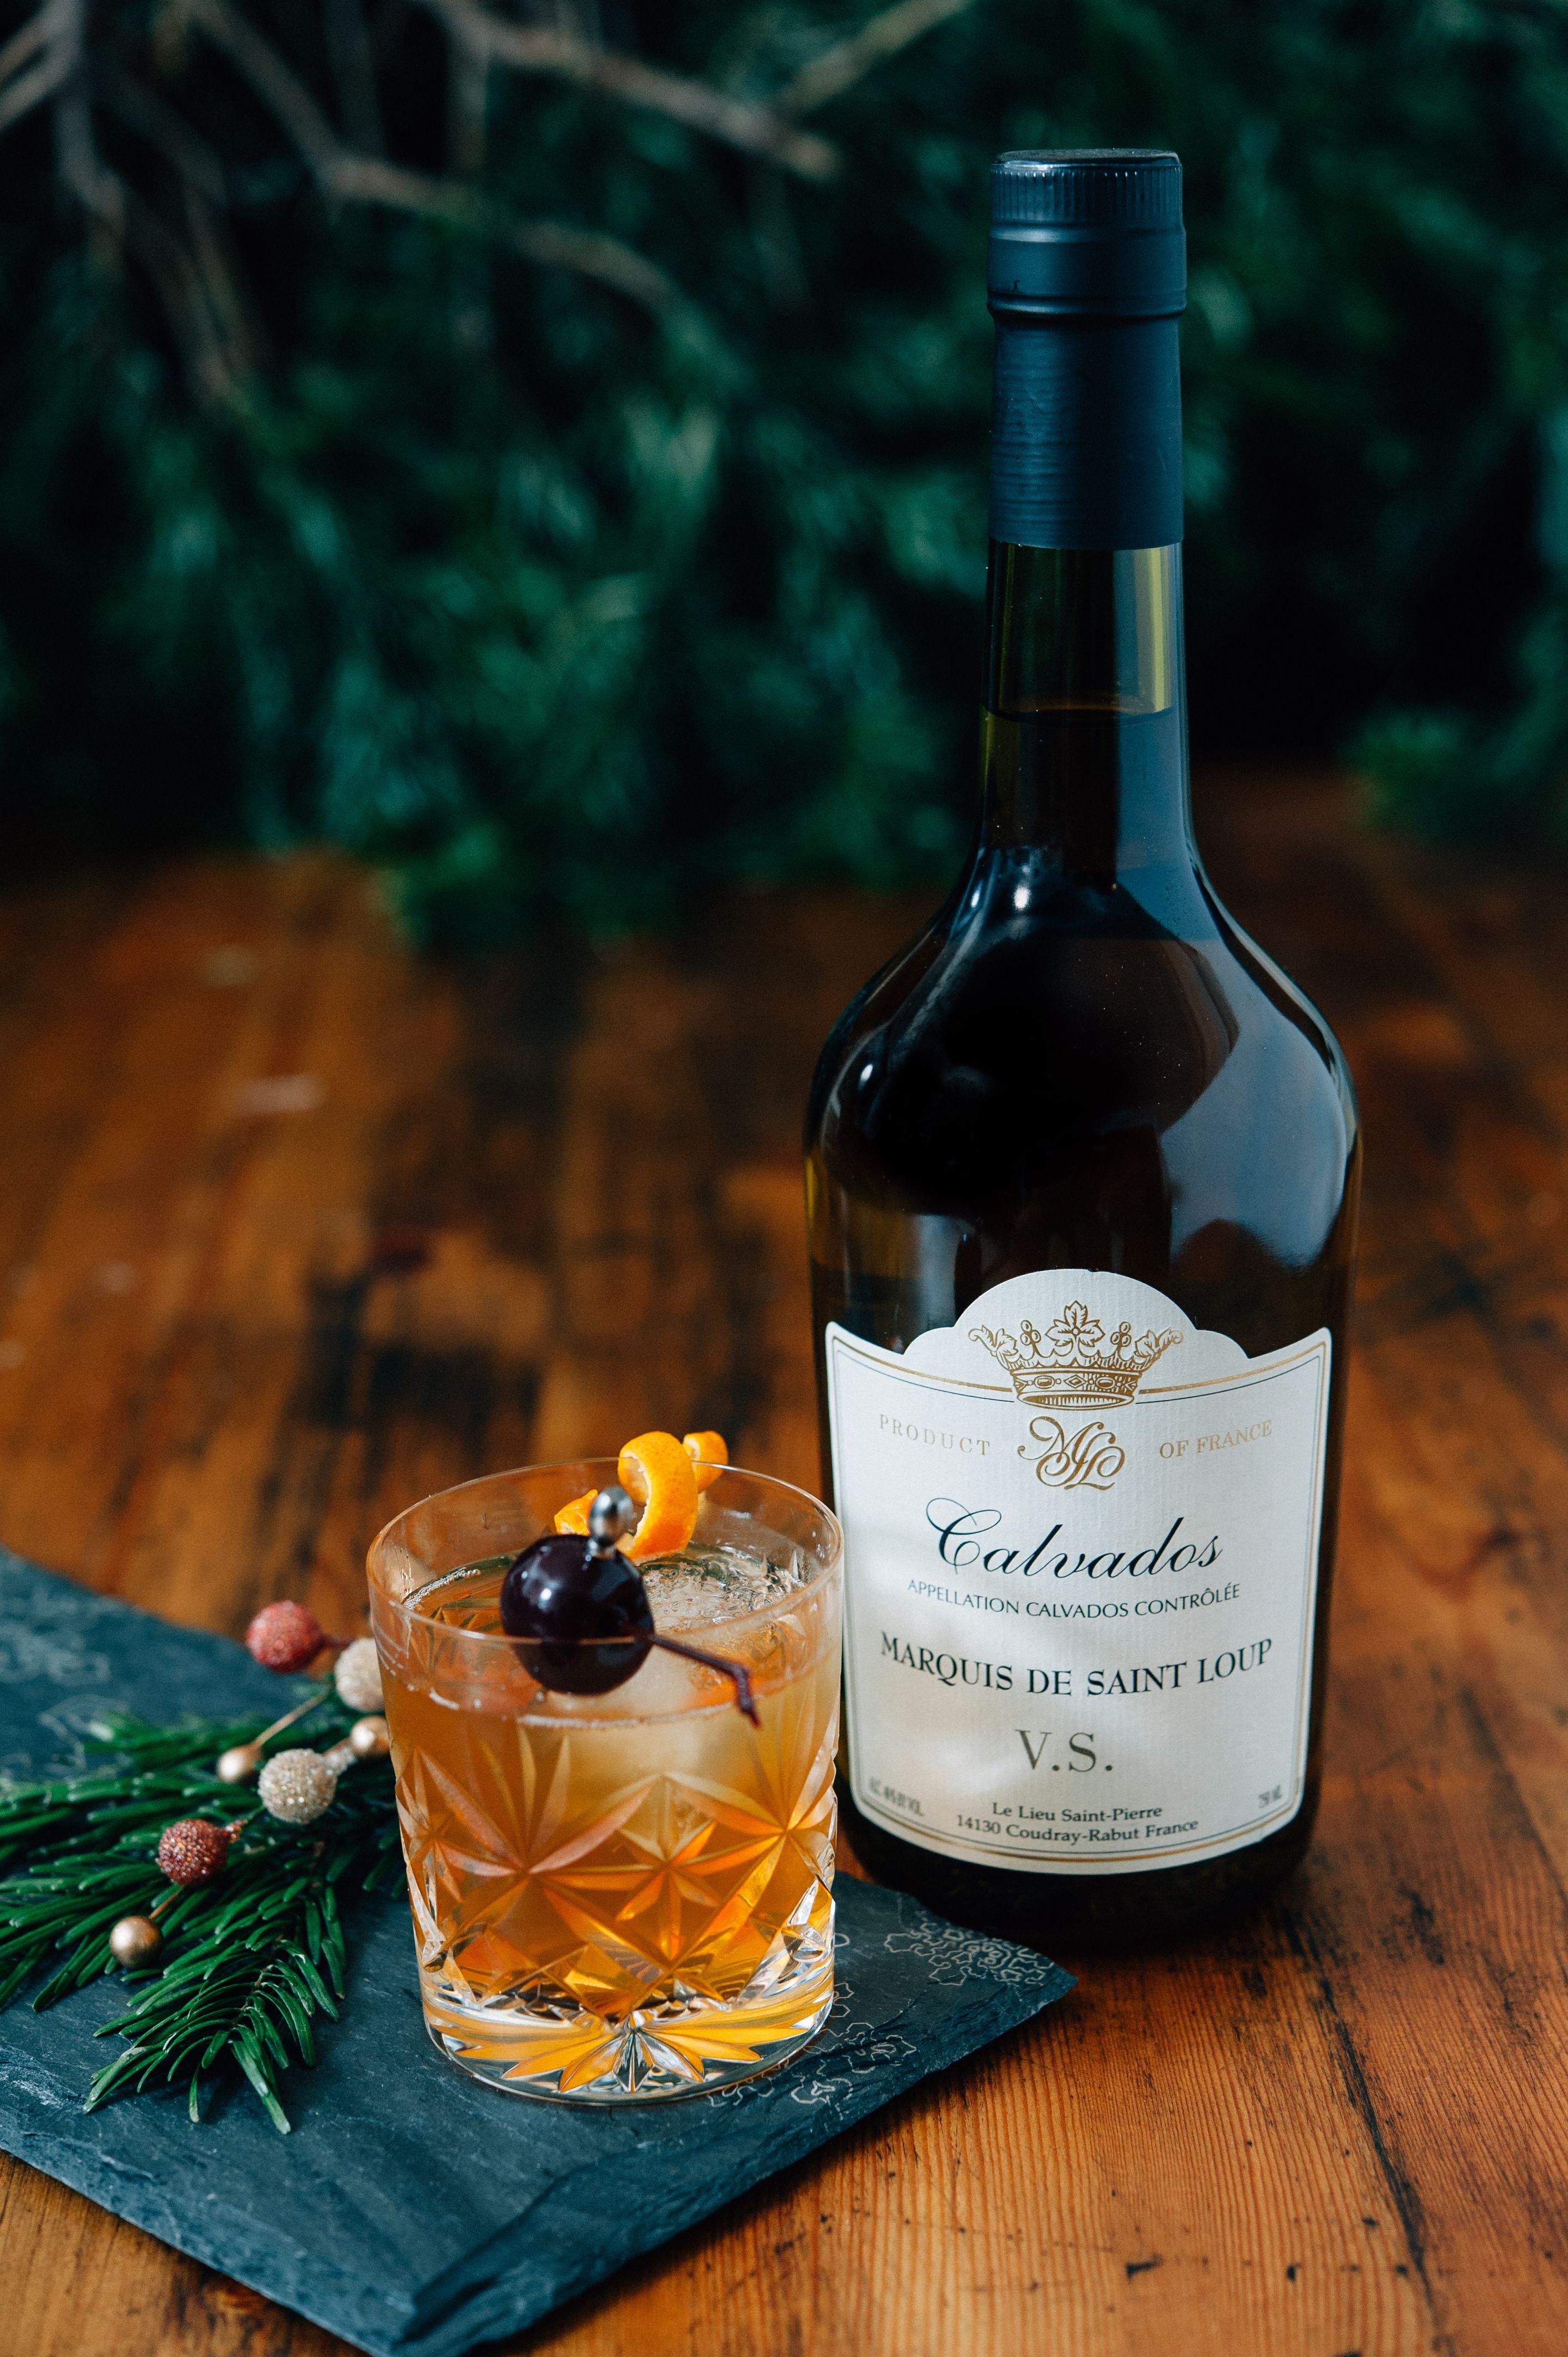 Winter photo shoot with Marquis de Saint Loup Calvados. #fooddecor #cider #farmtotable #foodphotography #beveragephotography #frenchcider #Calvados #cocktails